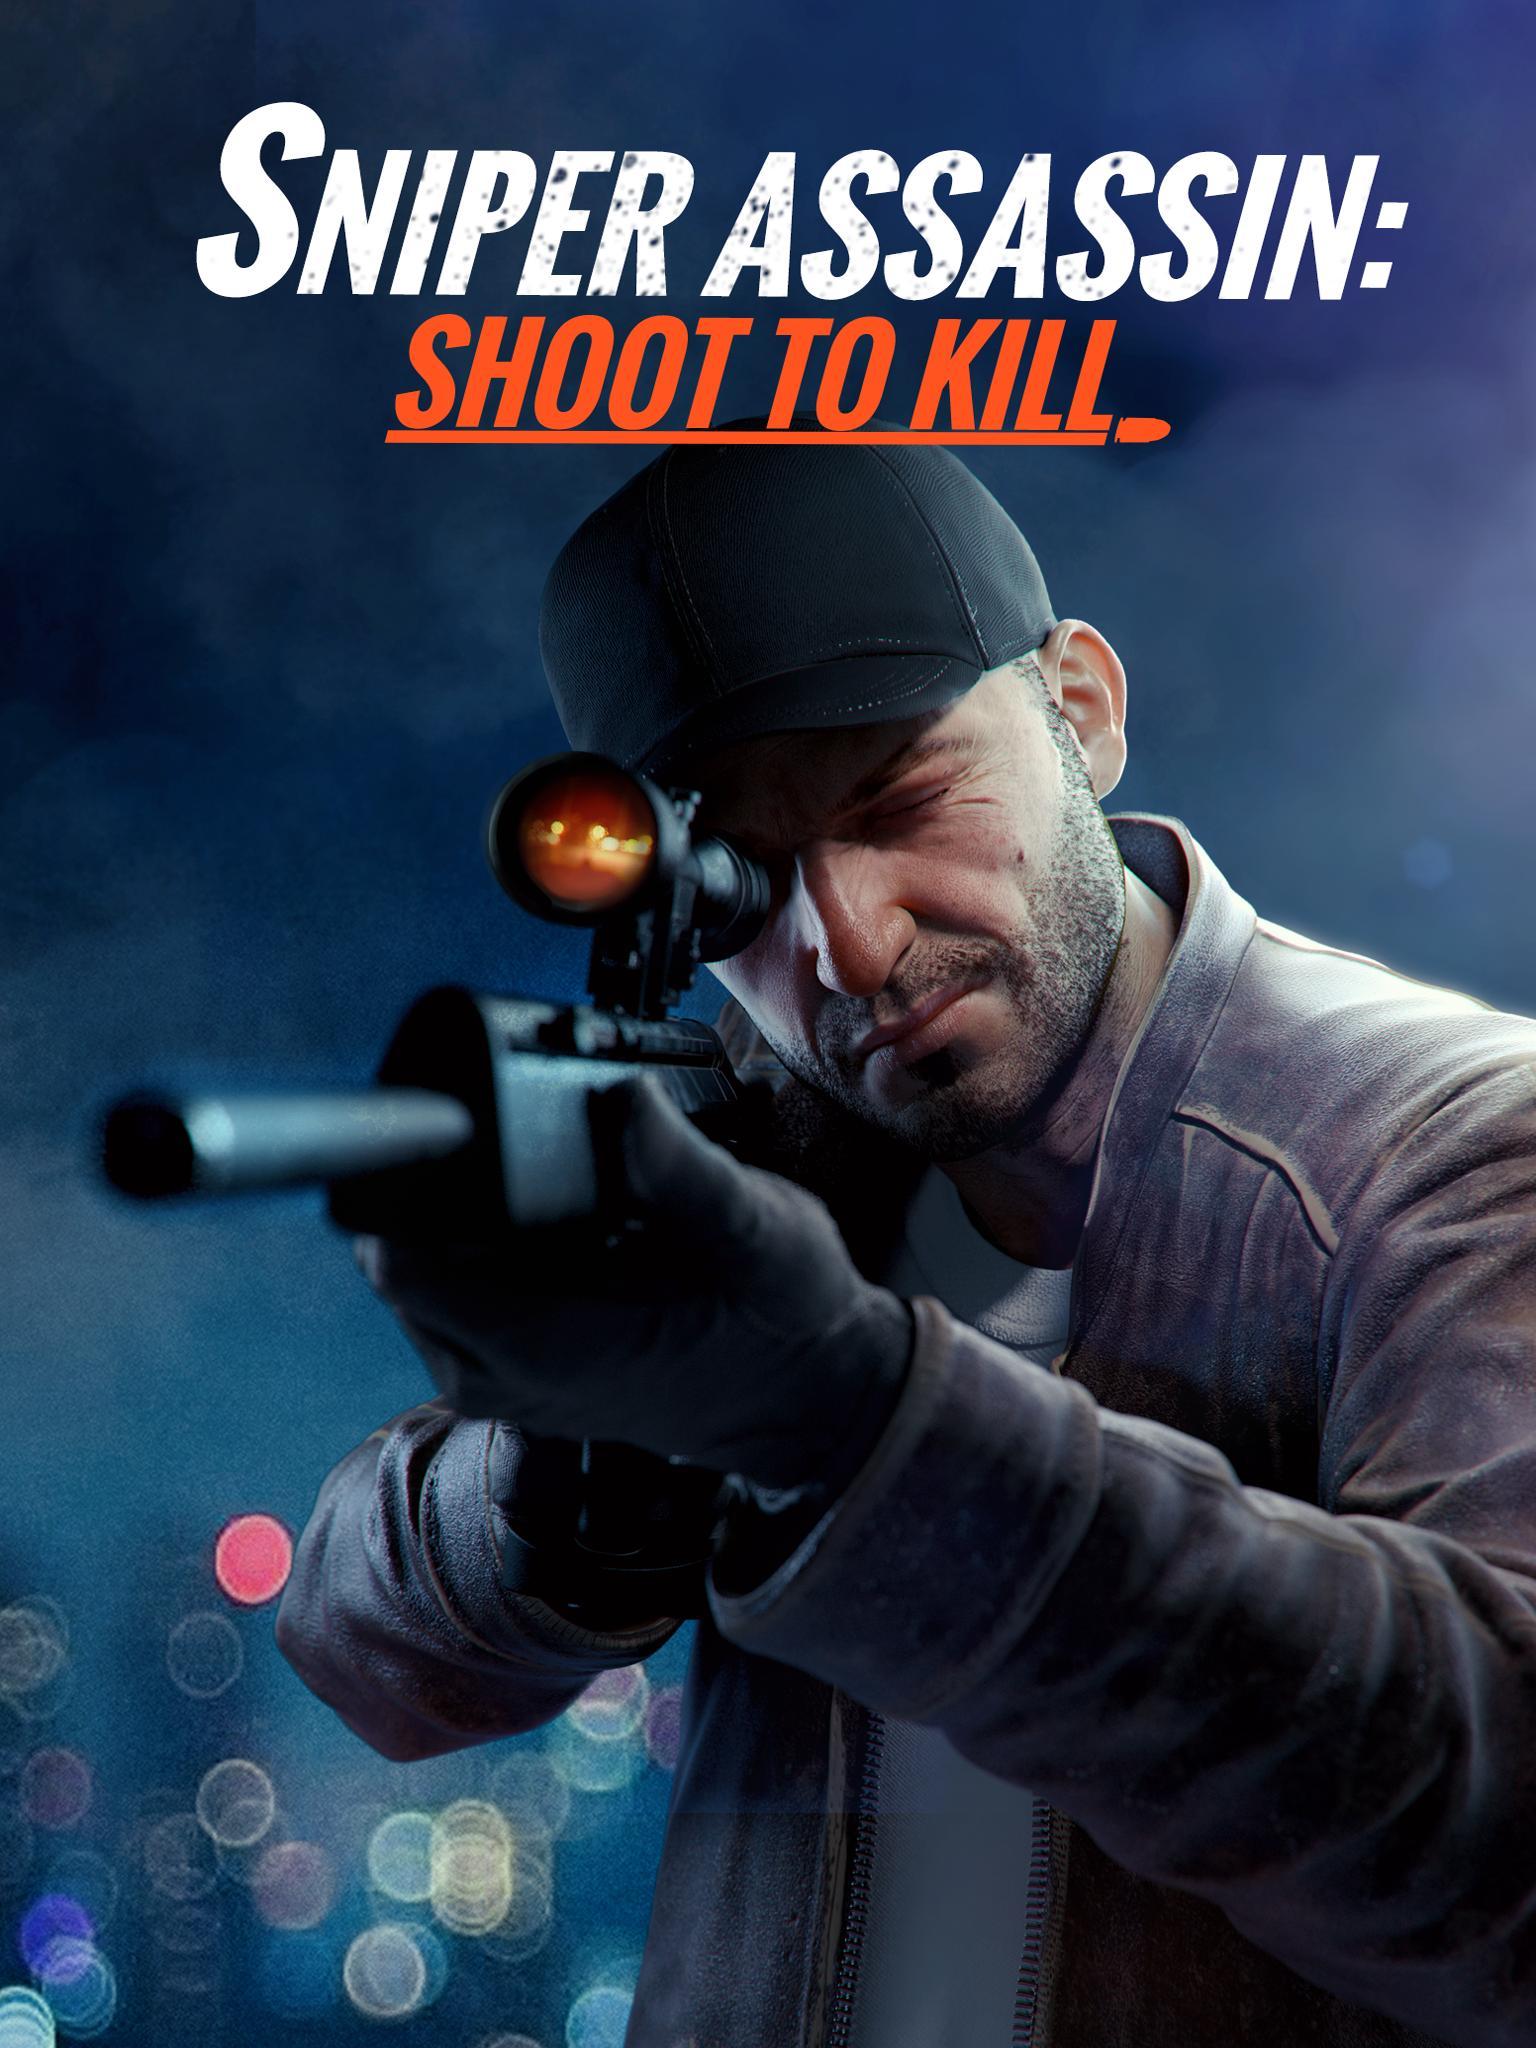 Sniper 3D Fun Free Online FPS Shooting Game 3.15.1 Screenshot 15